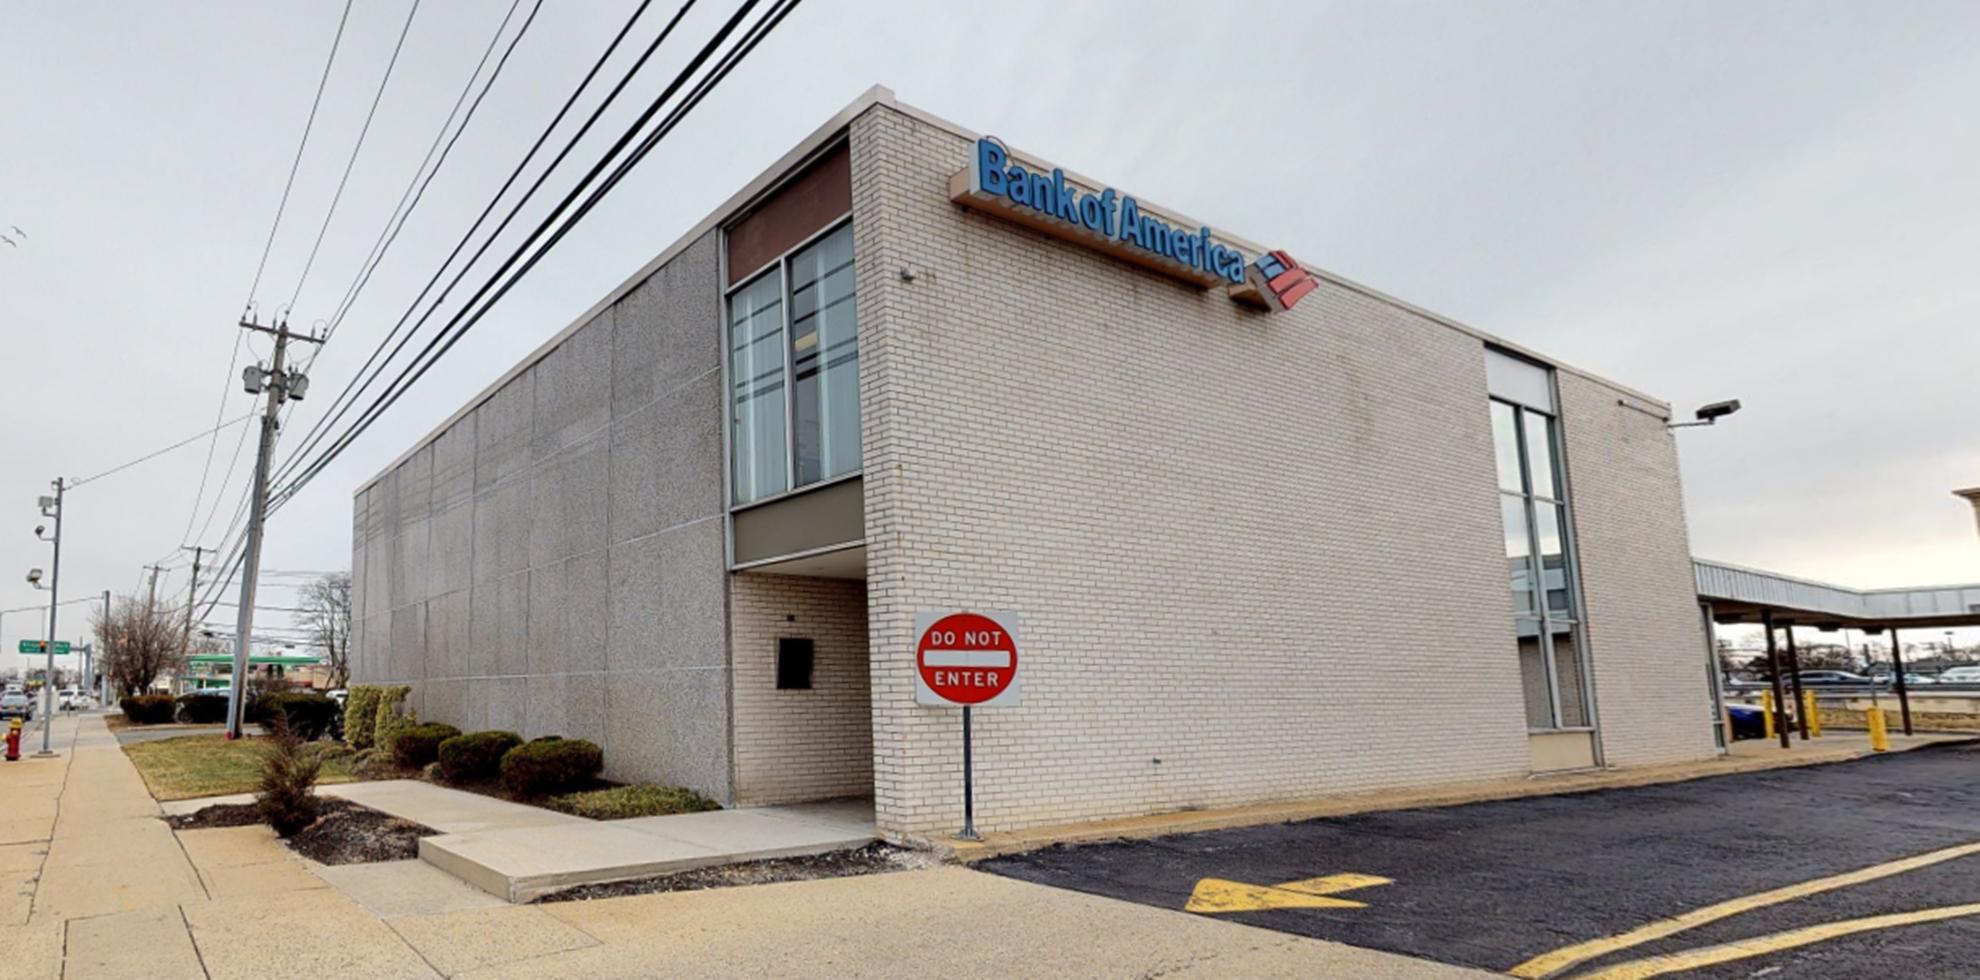 Bank of America financial center with drive-thru ATM | 5310 Sunrise Hwy, Massapequa Park, NY 11762